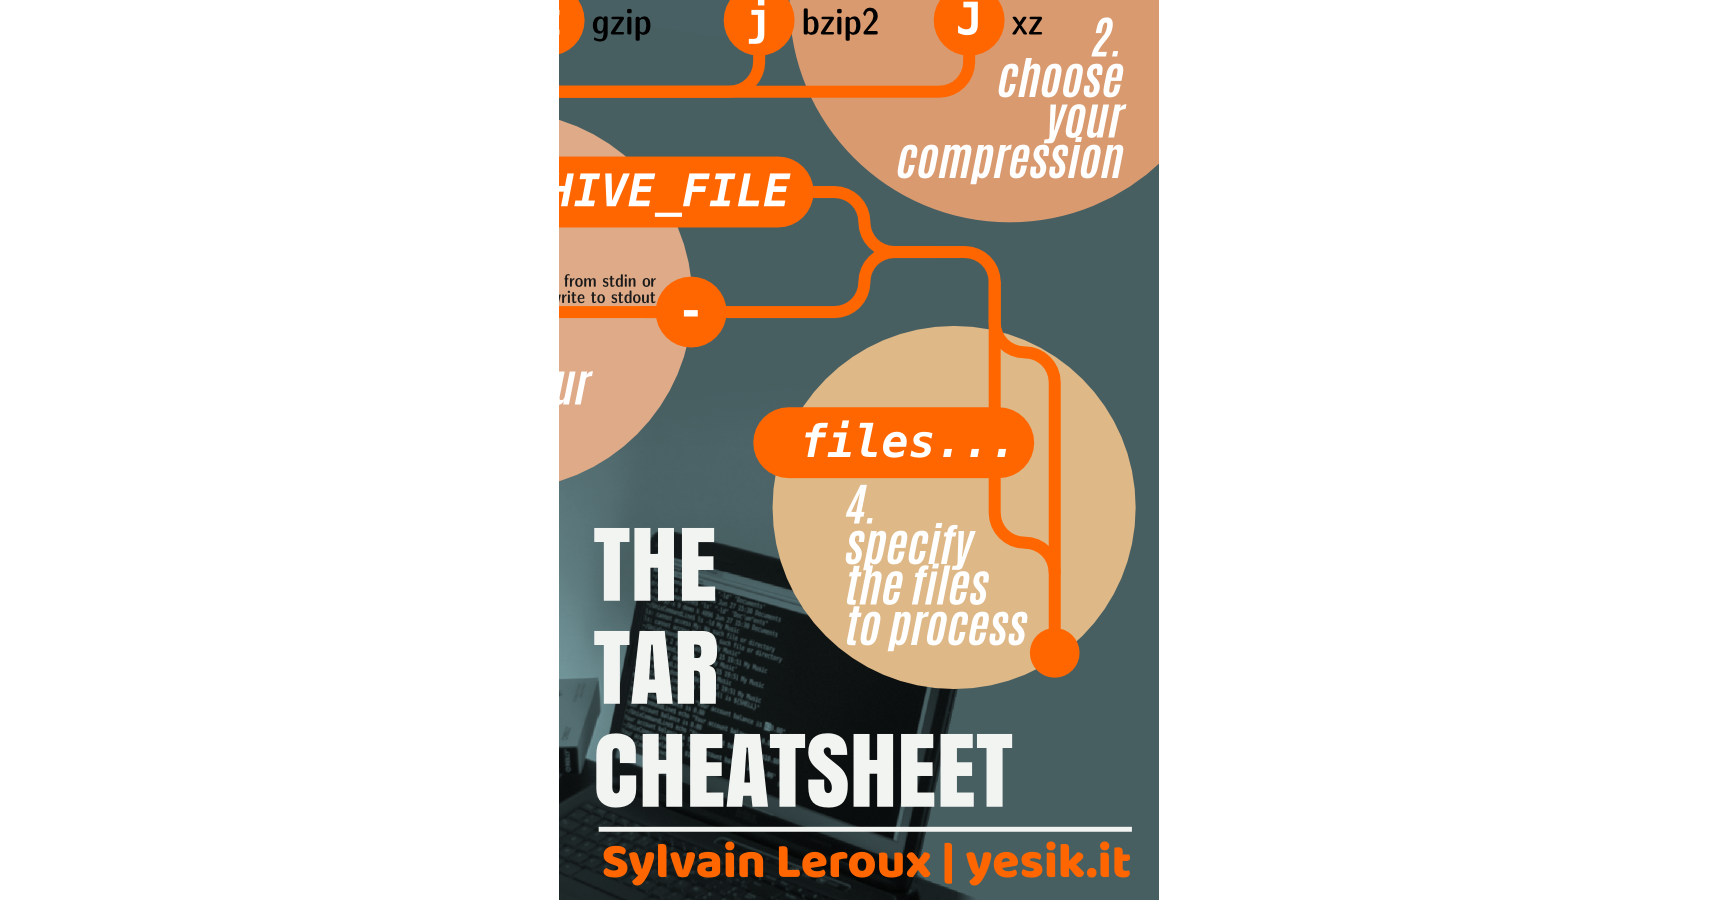 The Tar Cheatsheet | Yes, I Know IT !